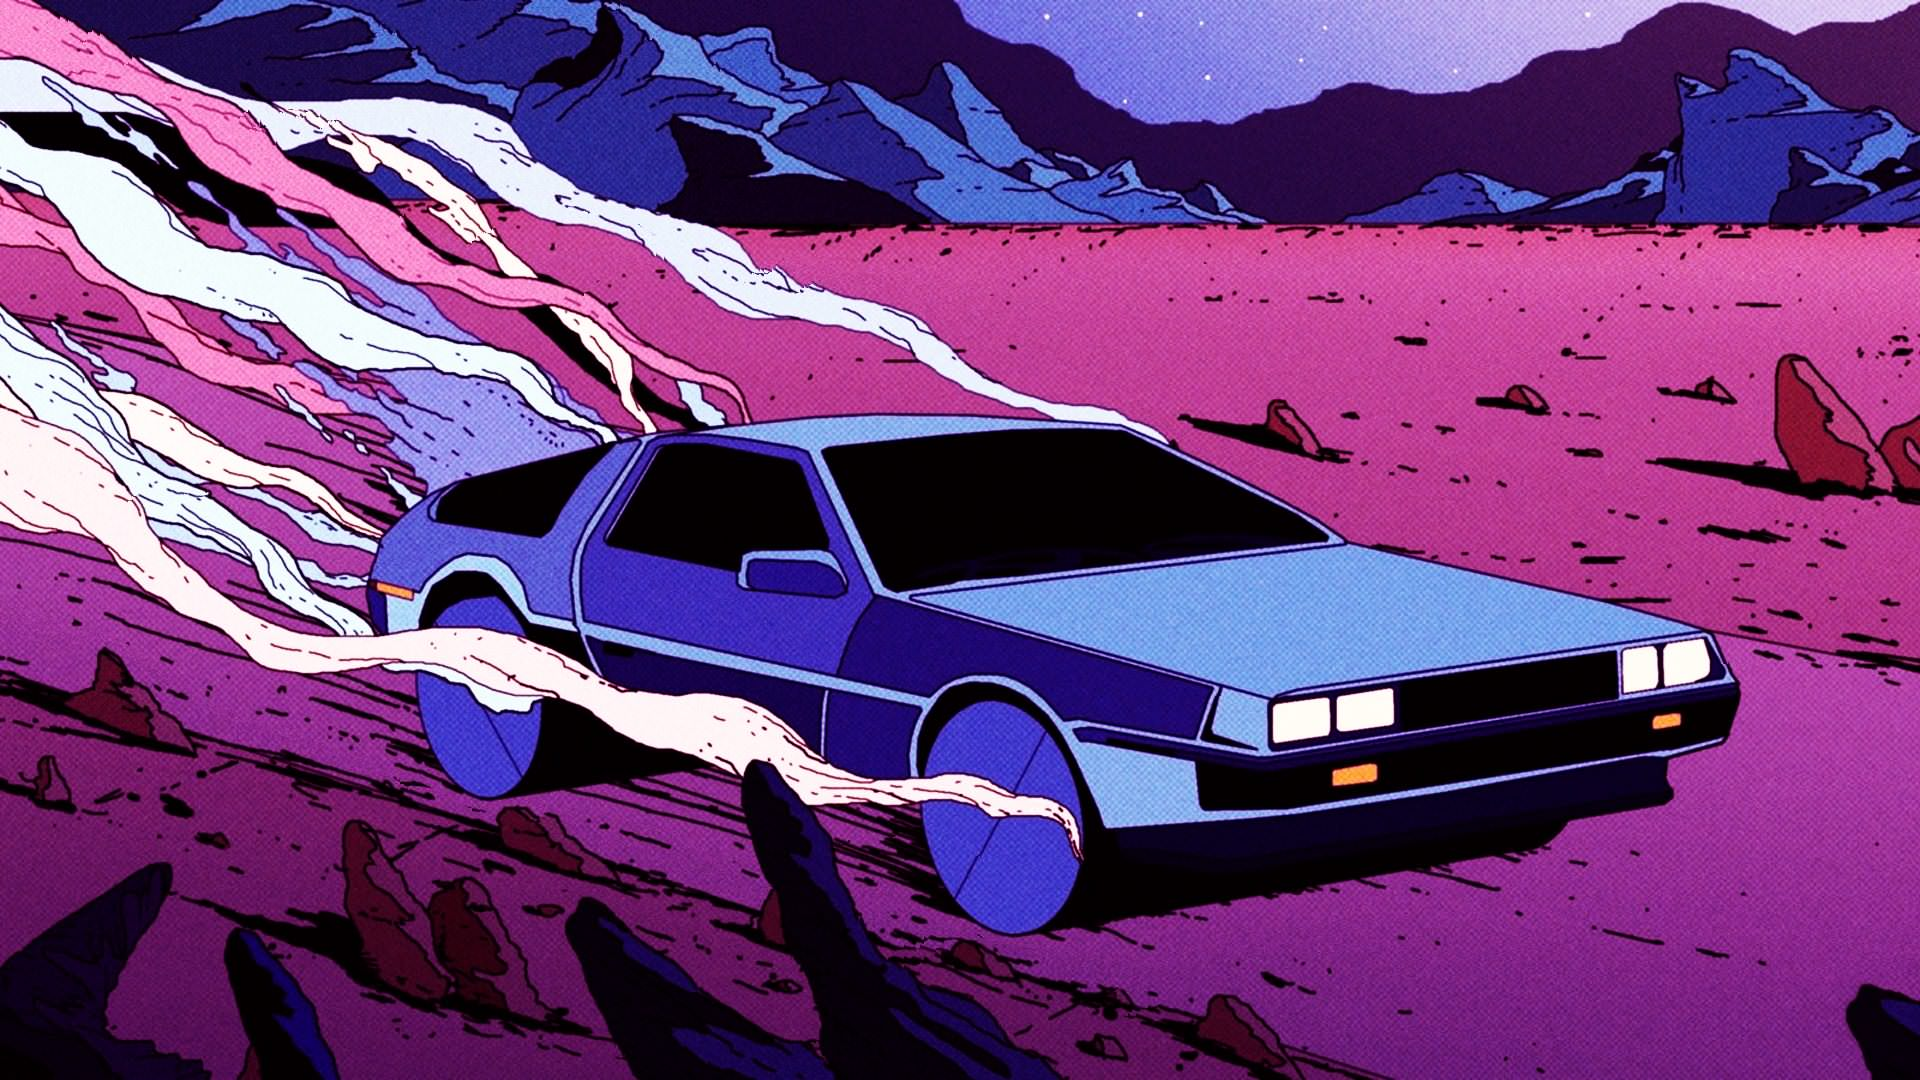 General 1920x1080 retrowave car pink DeLorean mountains blue desert Retro style